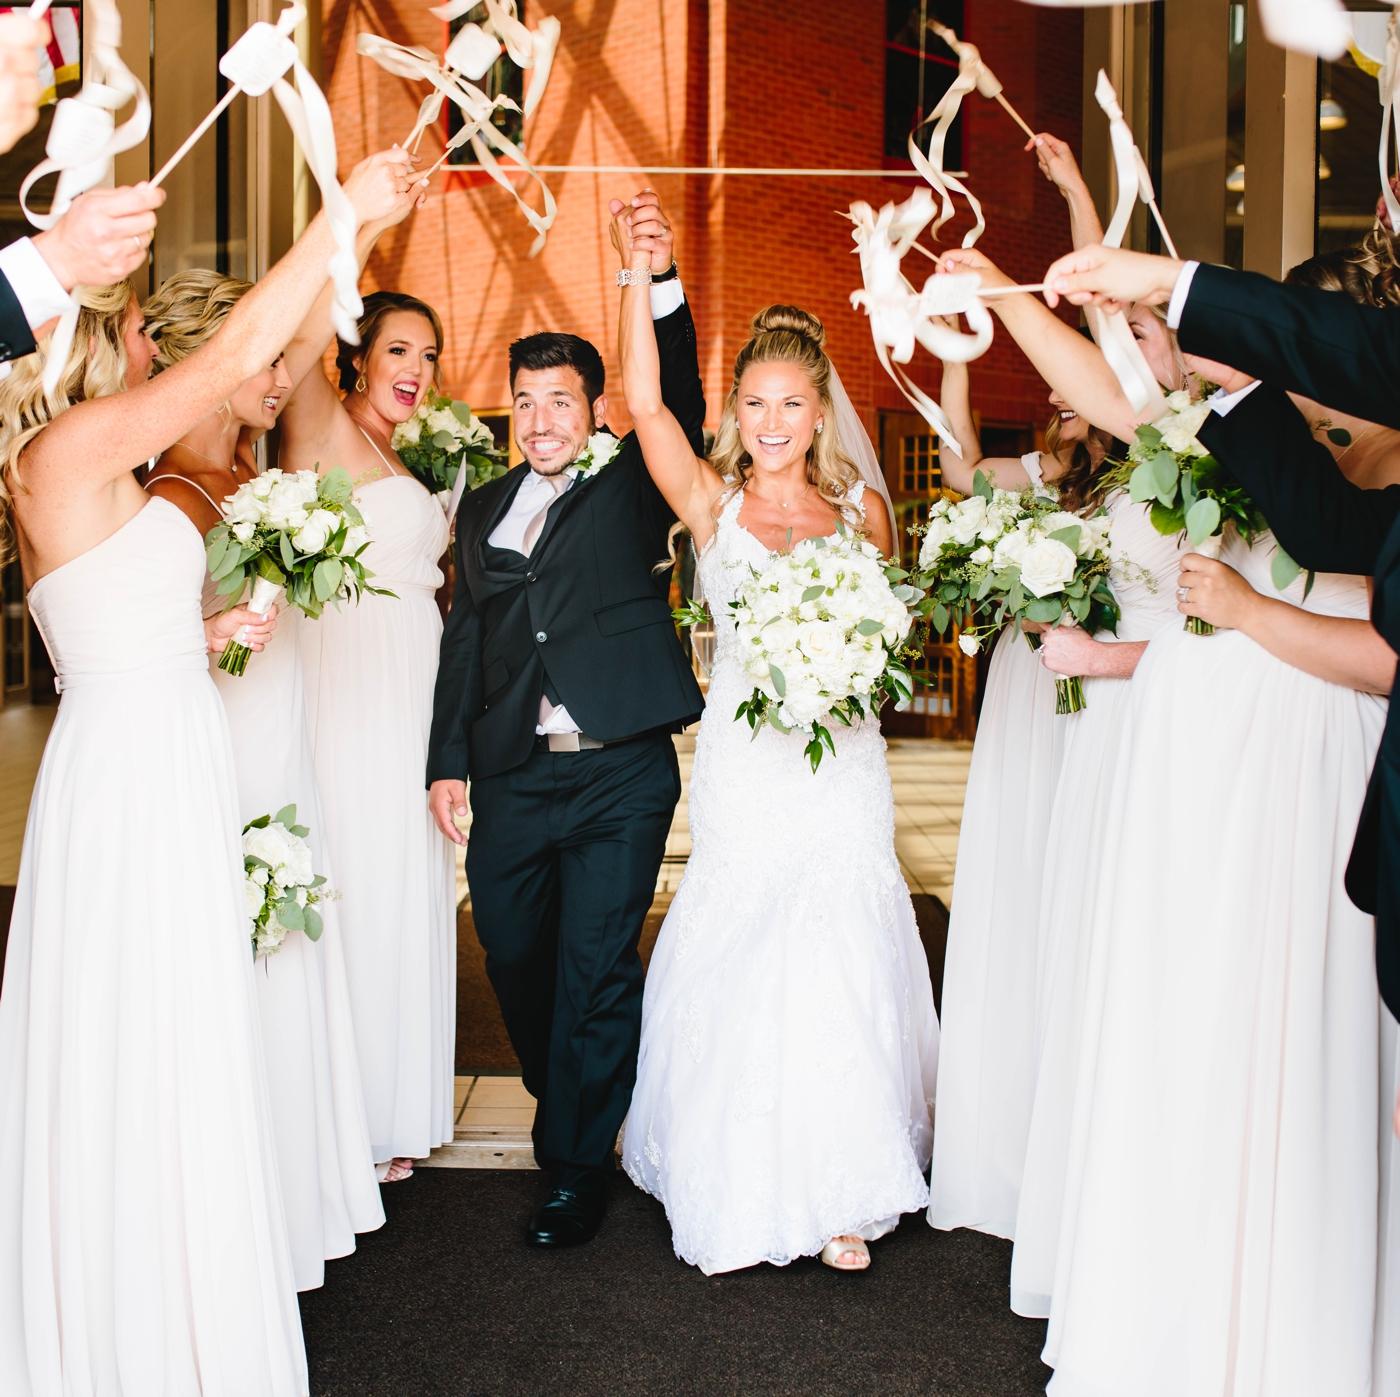 chicago-fine-art-wedding-photography-patano27